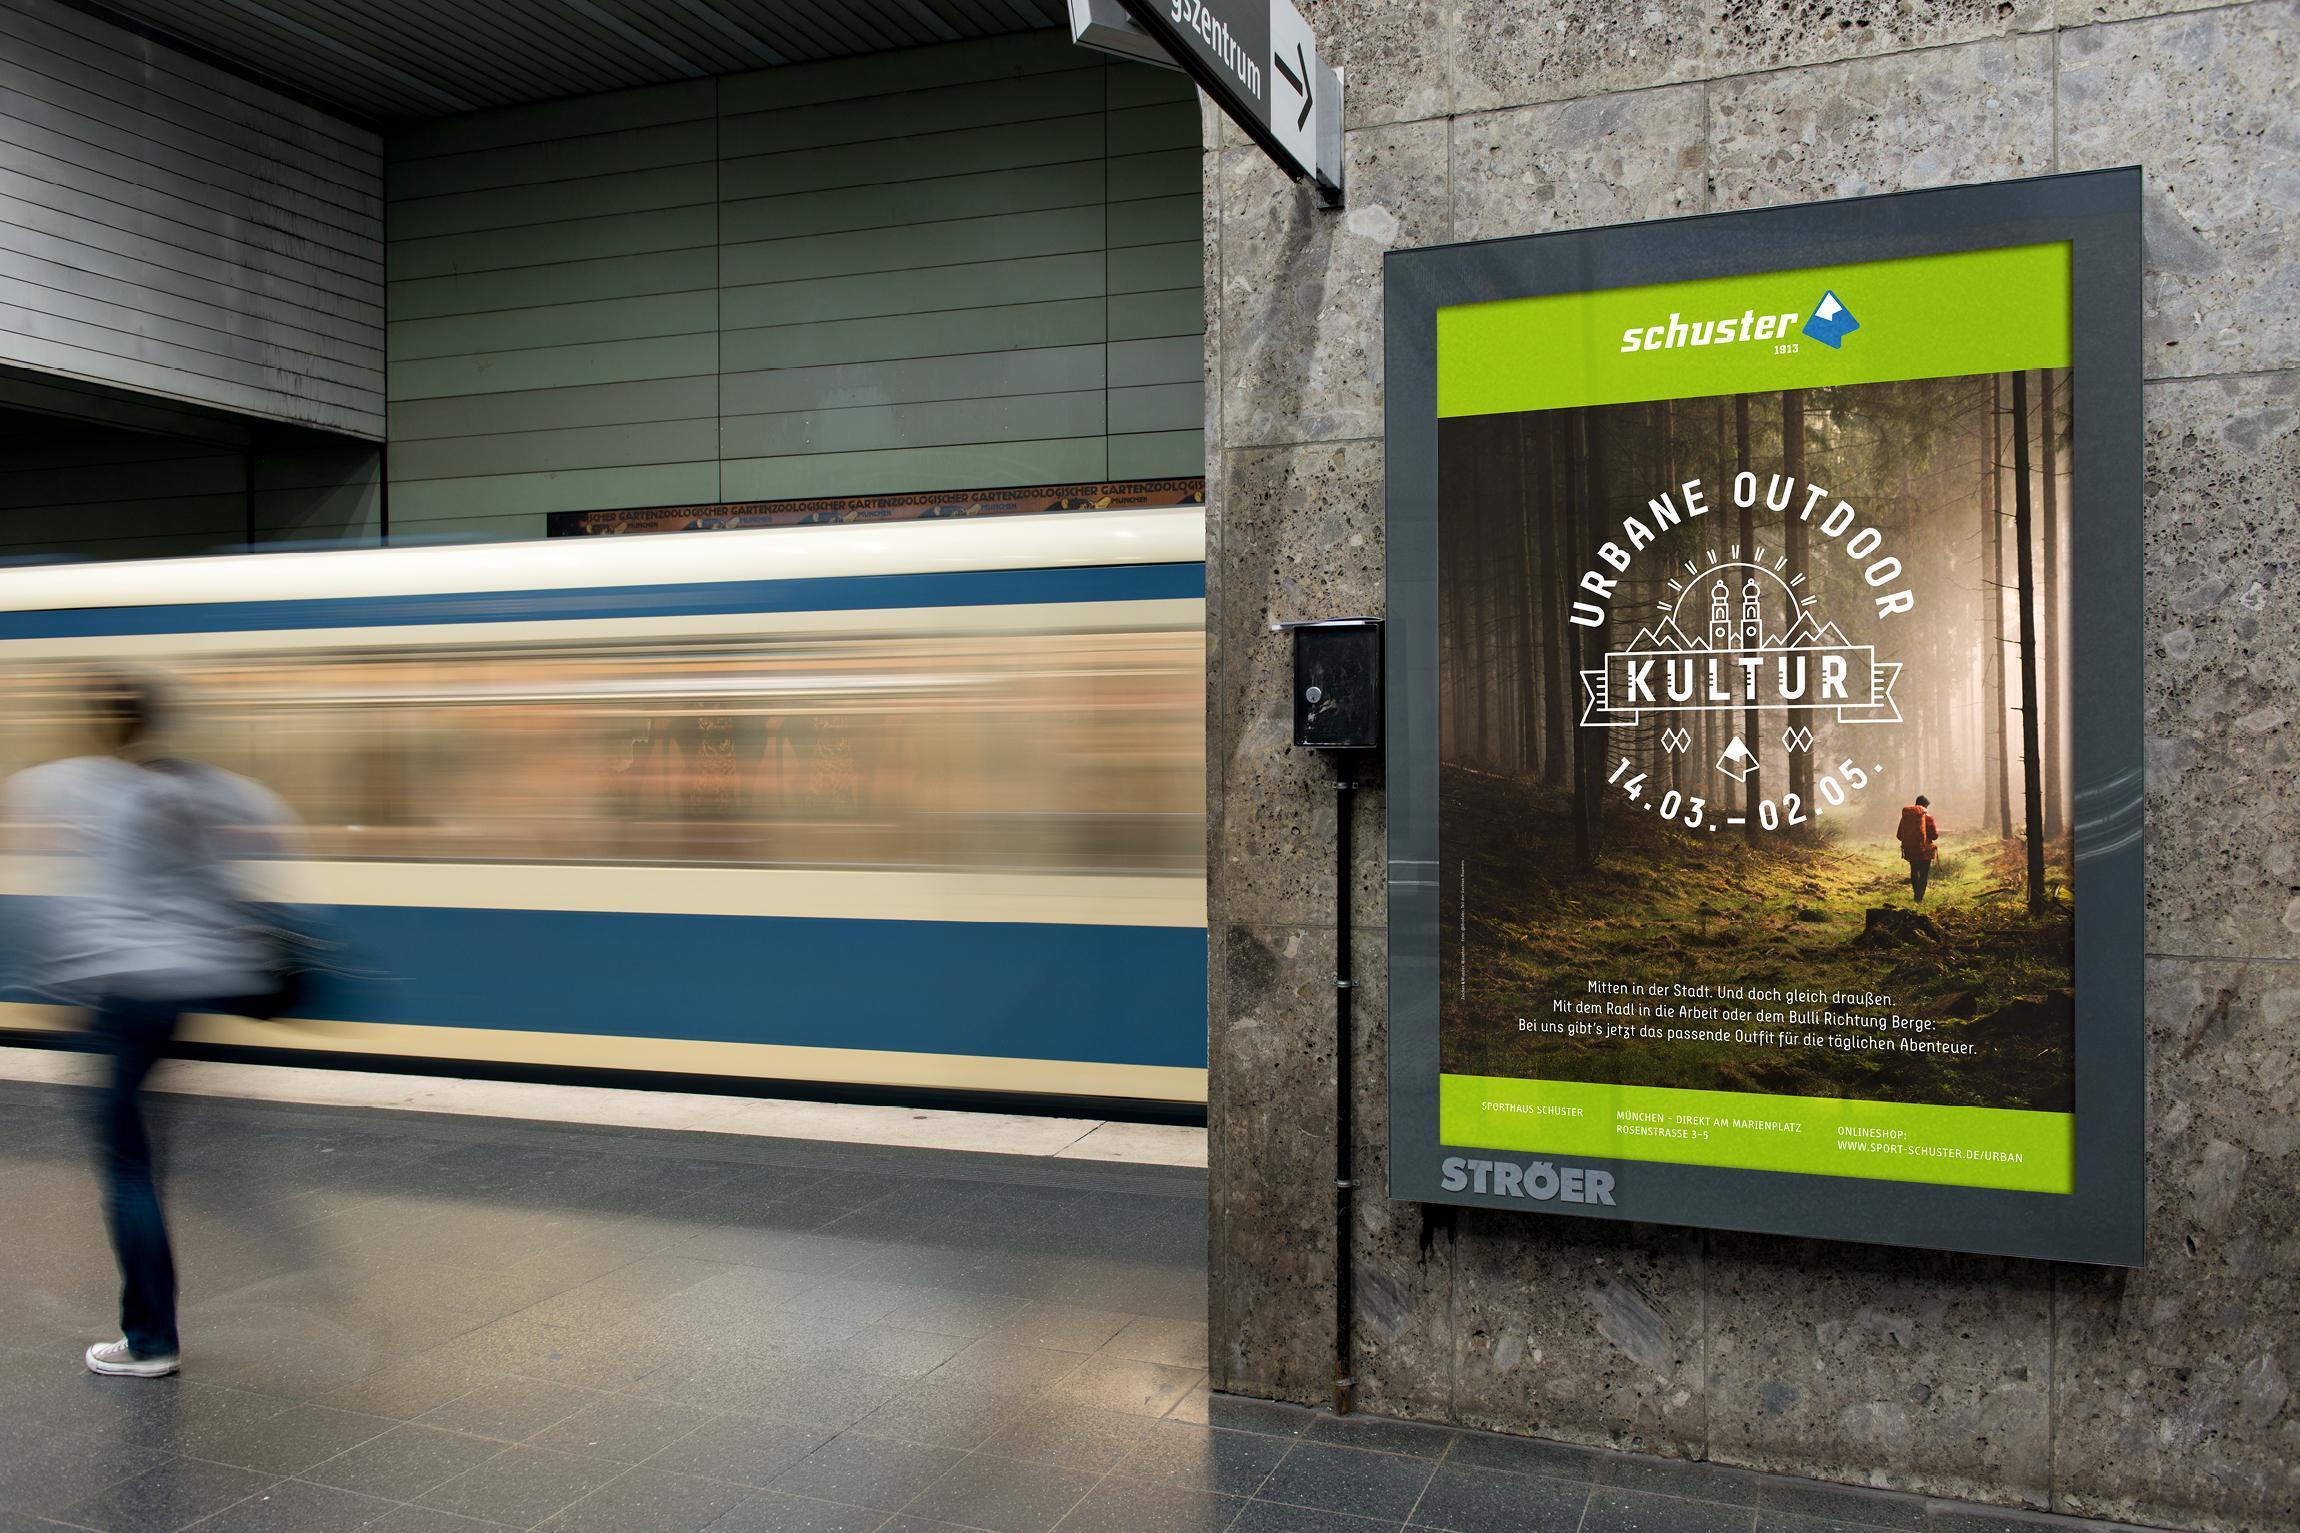 sporthaus_schuster_urban_outsider_kampagne_4.jpg